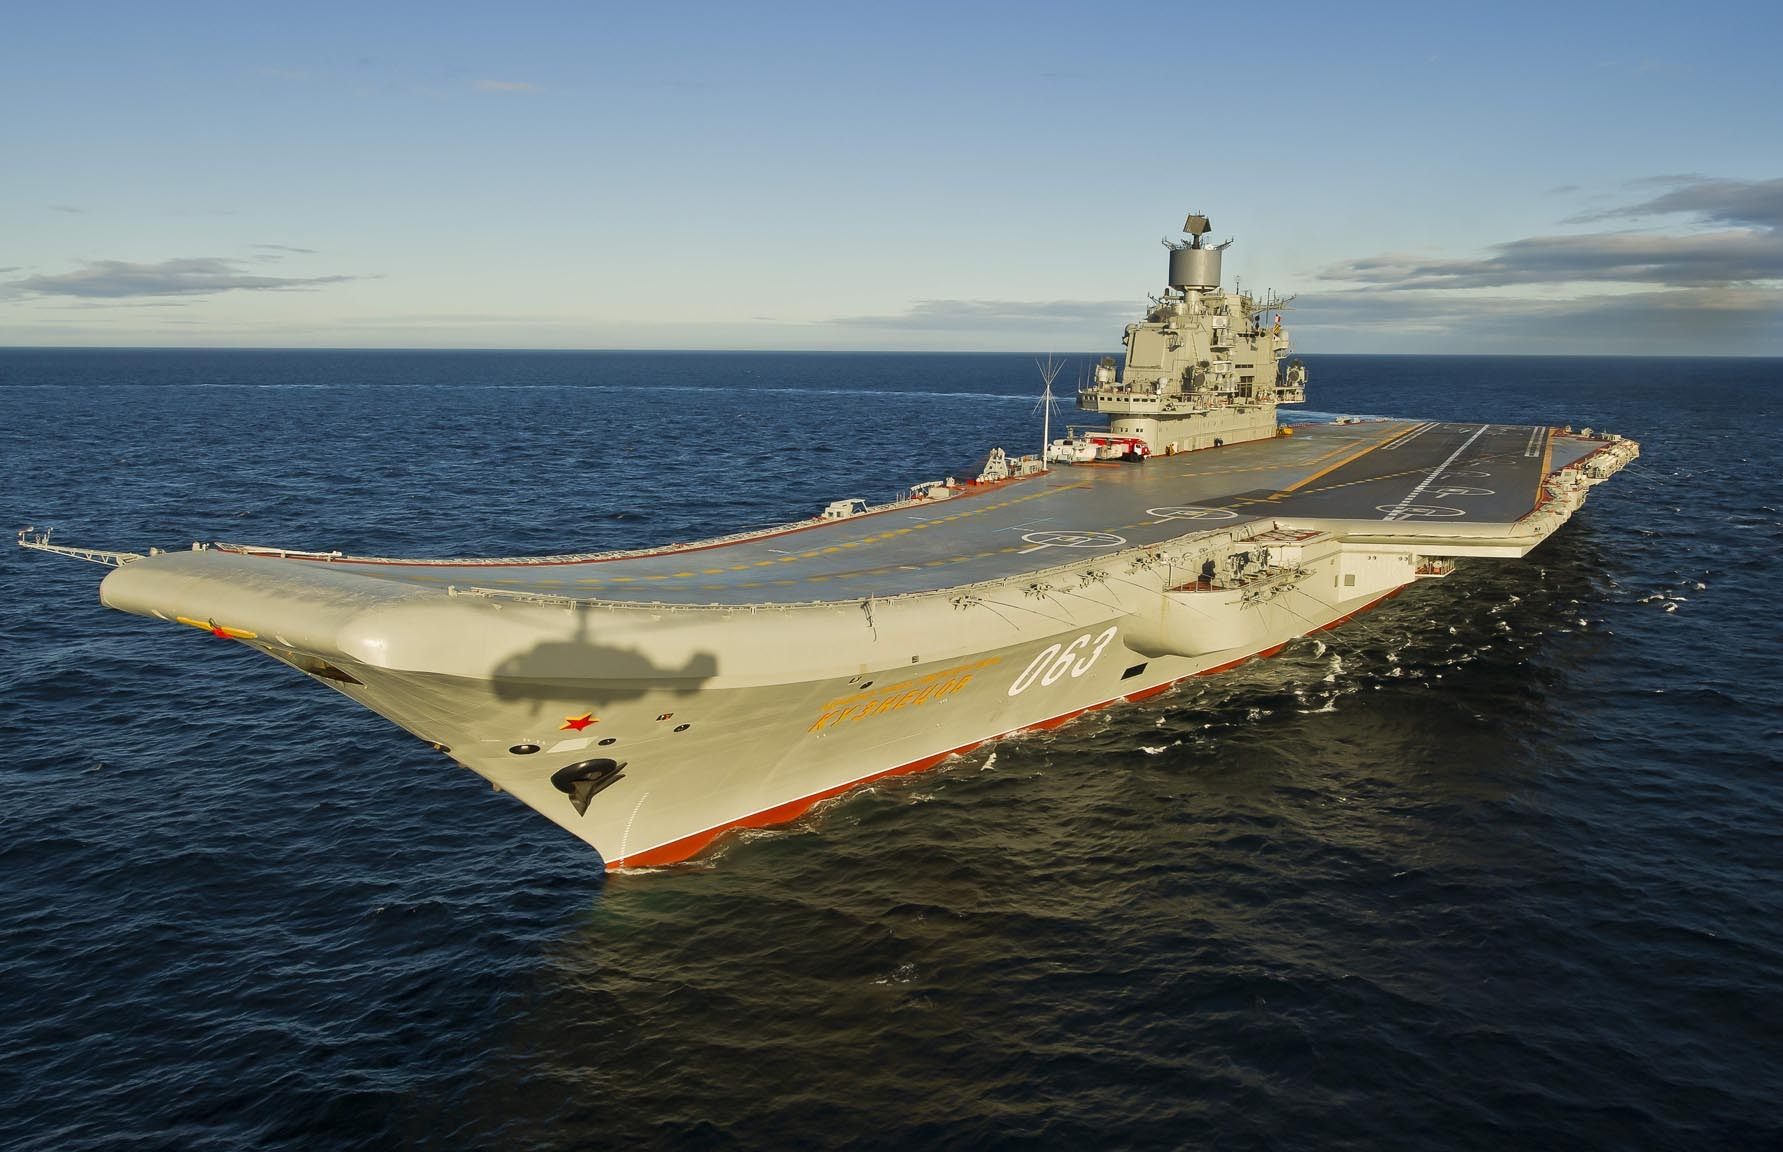 Авианосец адмирал Кузнецов в походе Разворот в море